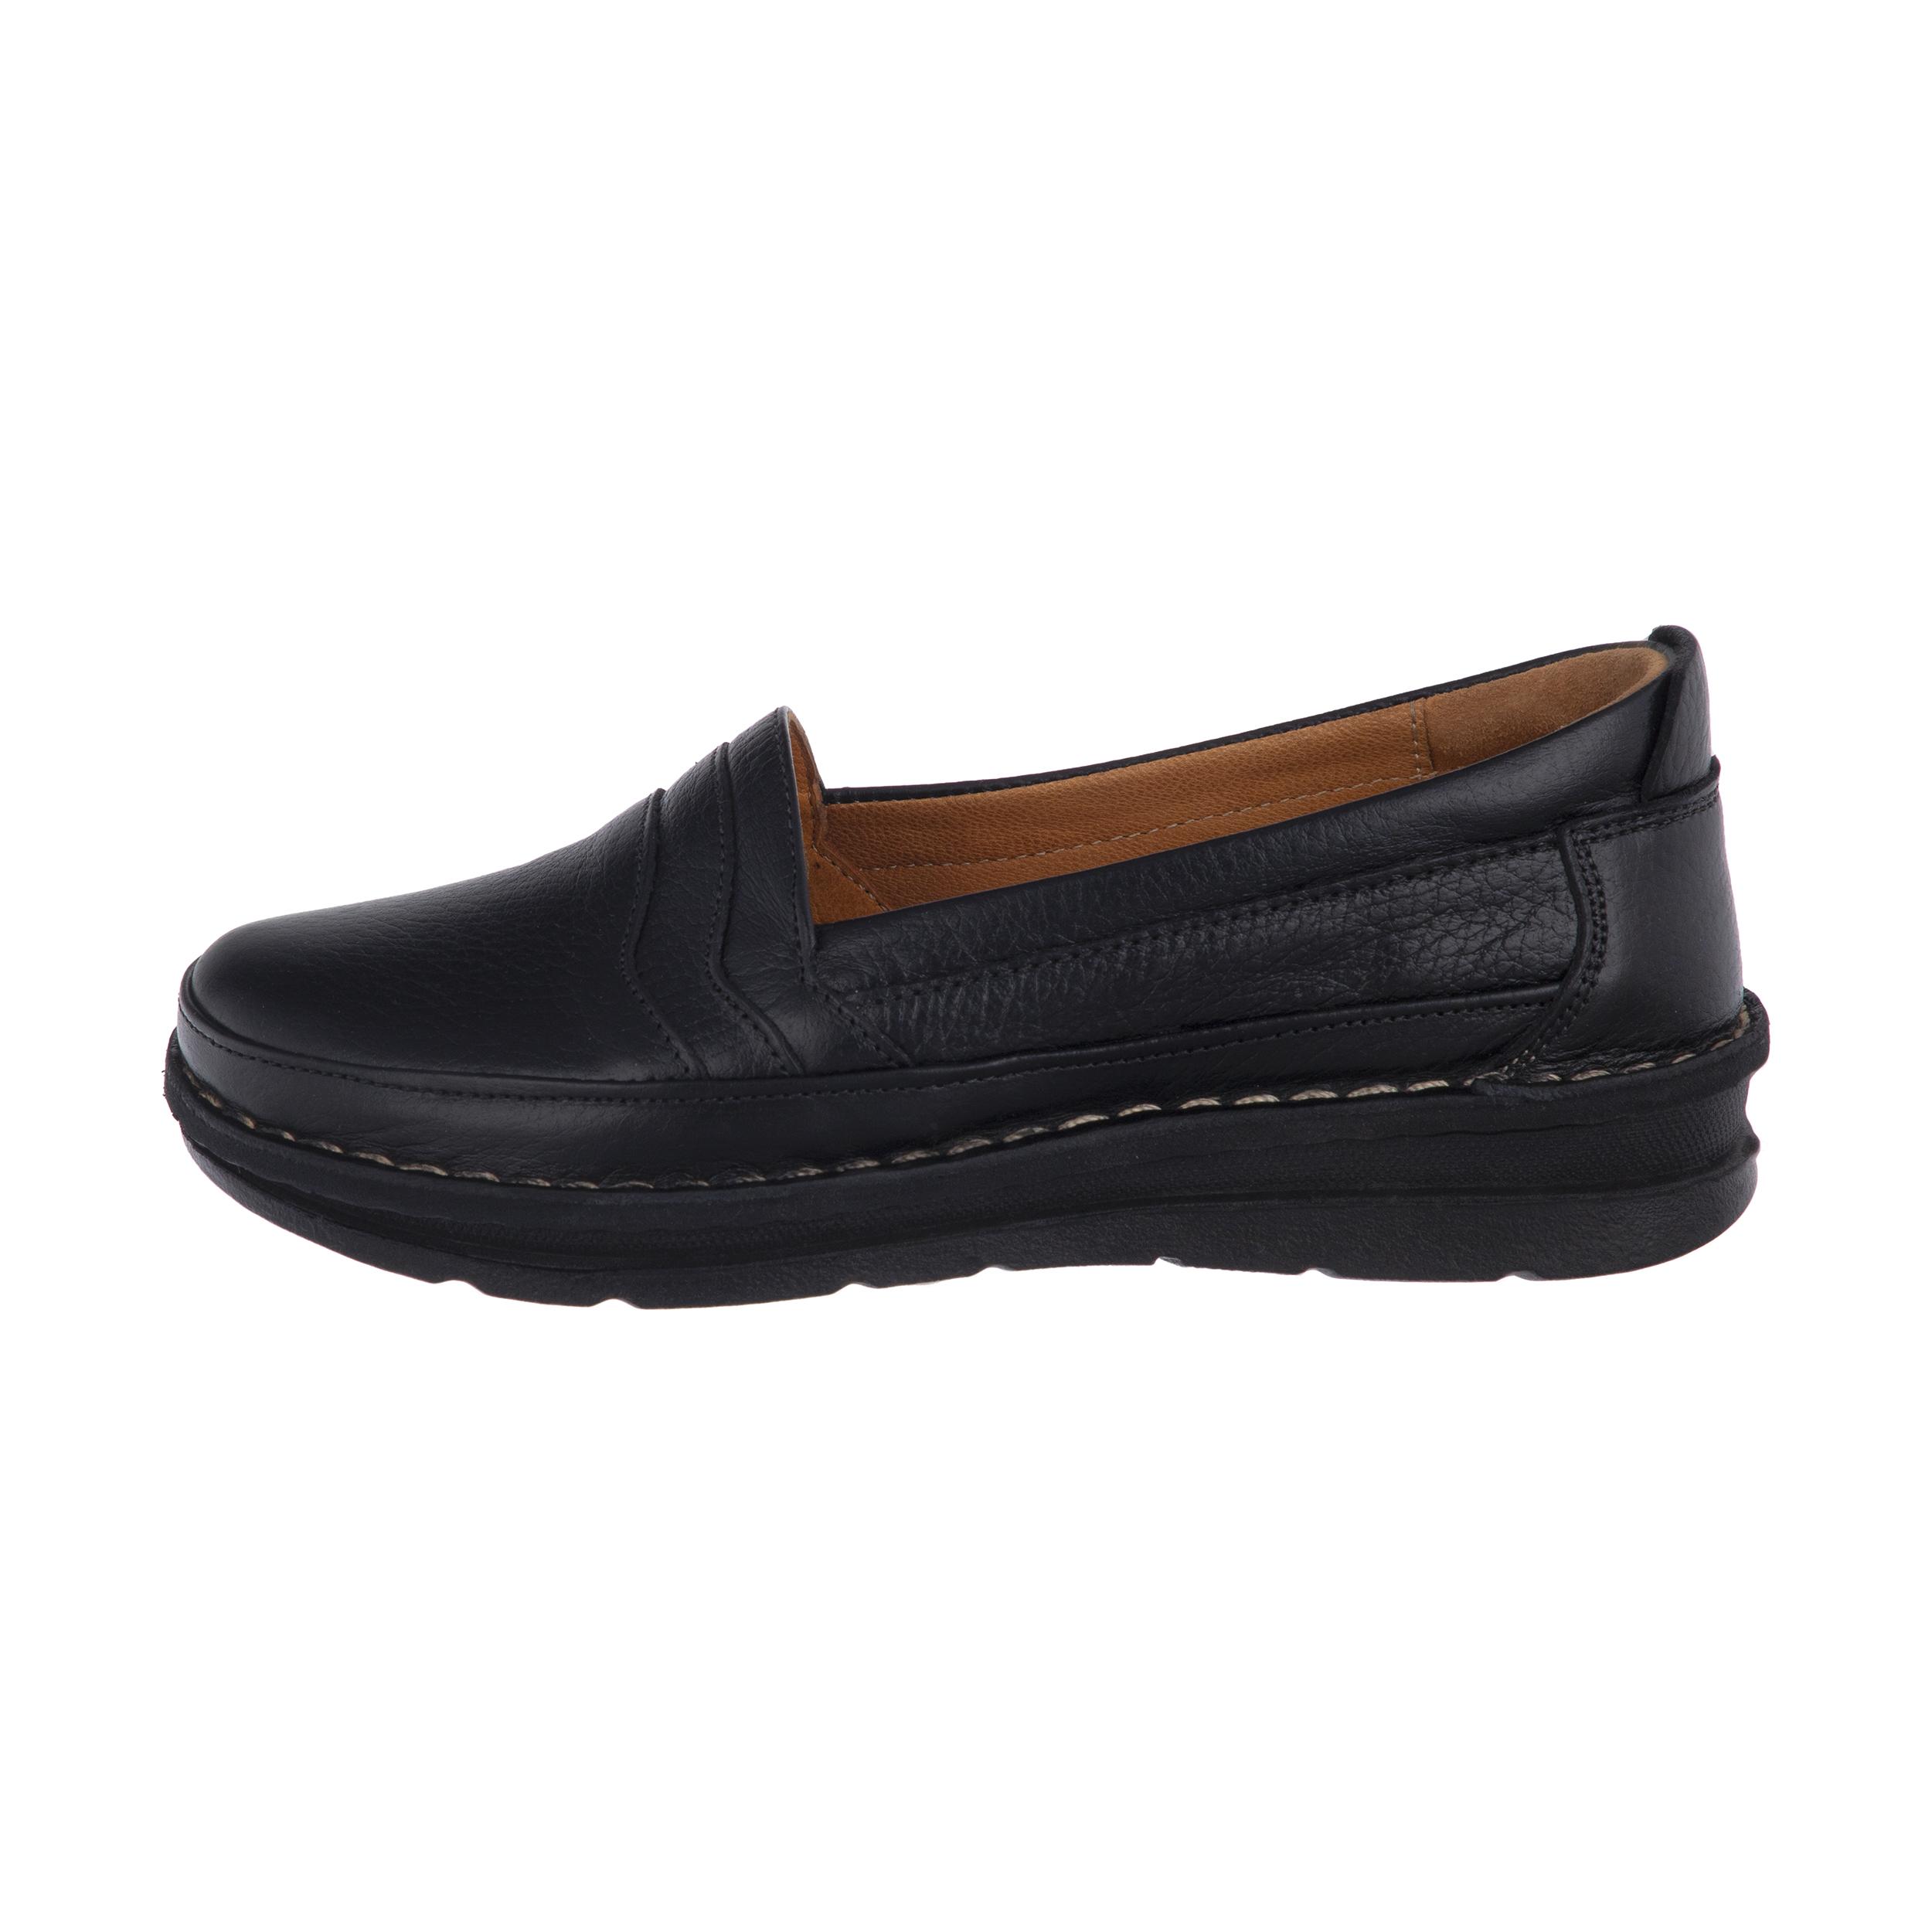 کفش روزمره زنانه مایان مدل 8801A500101